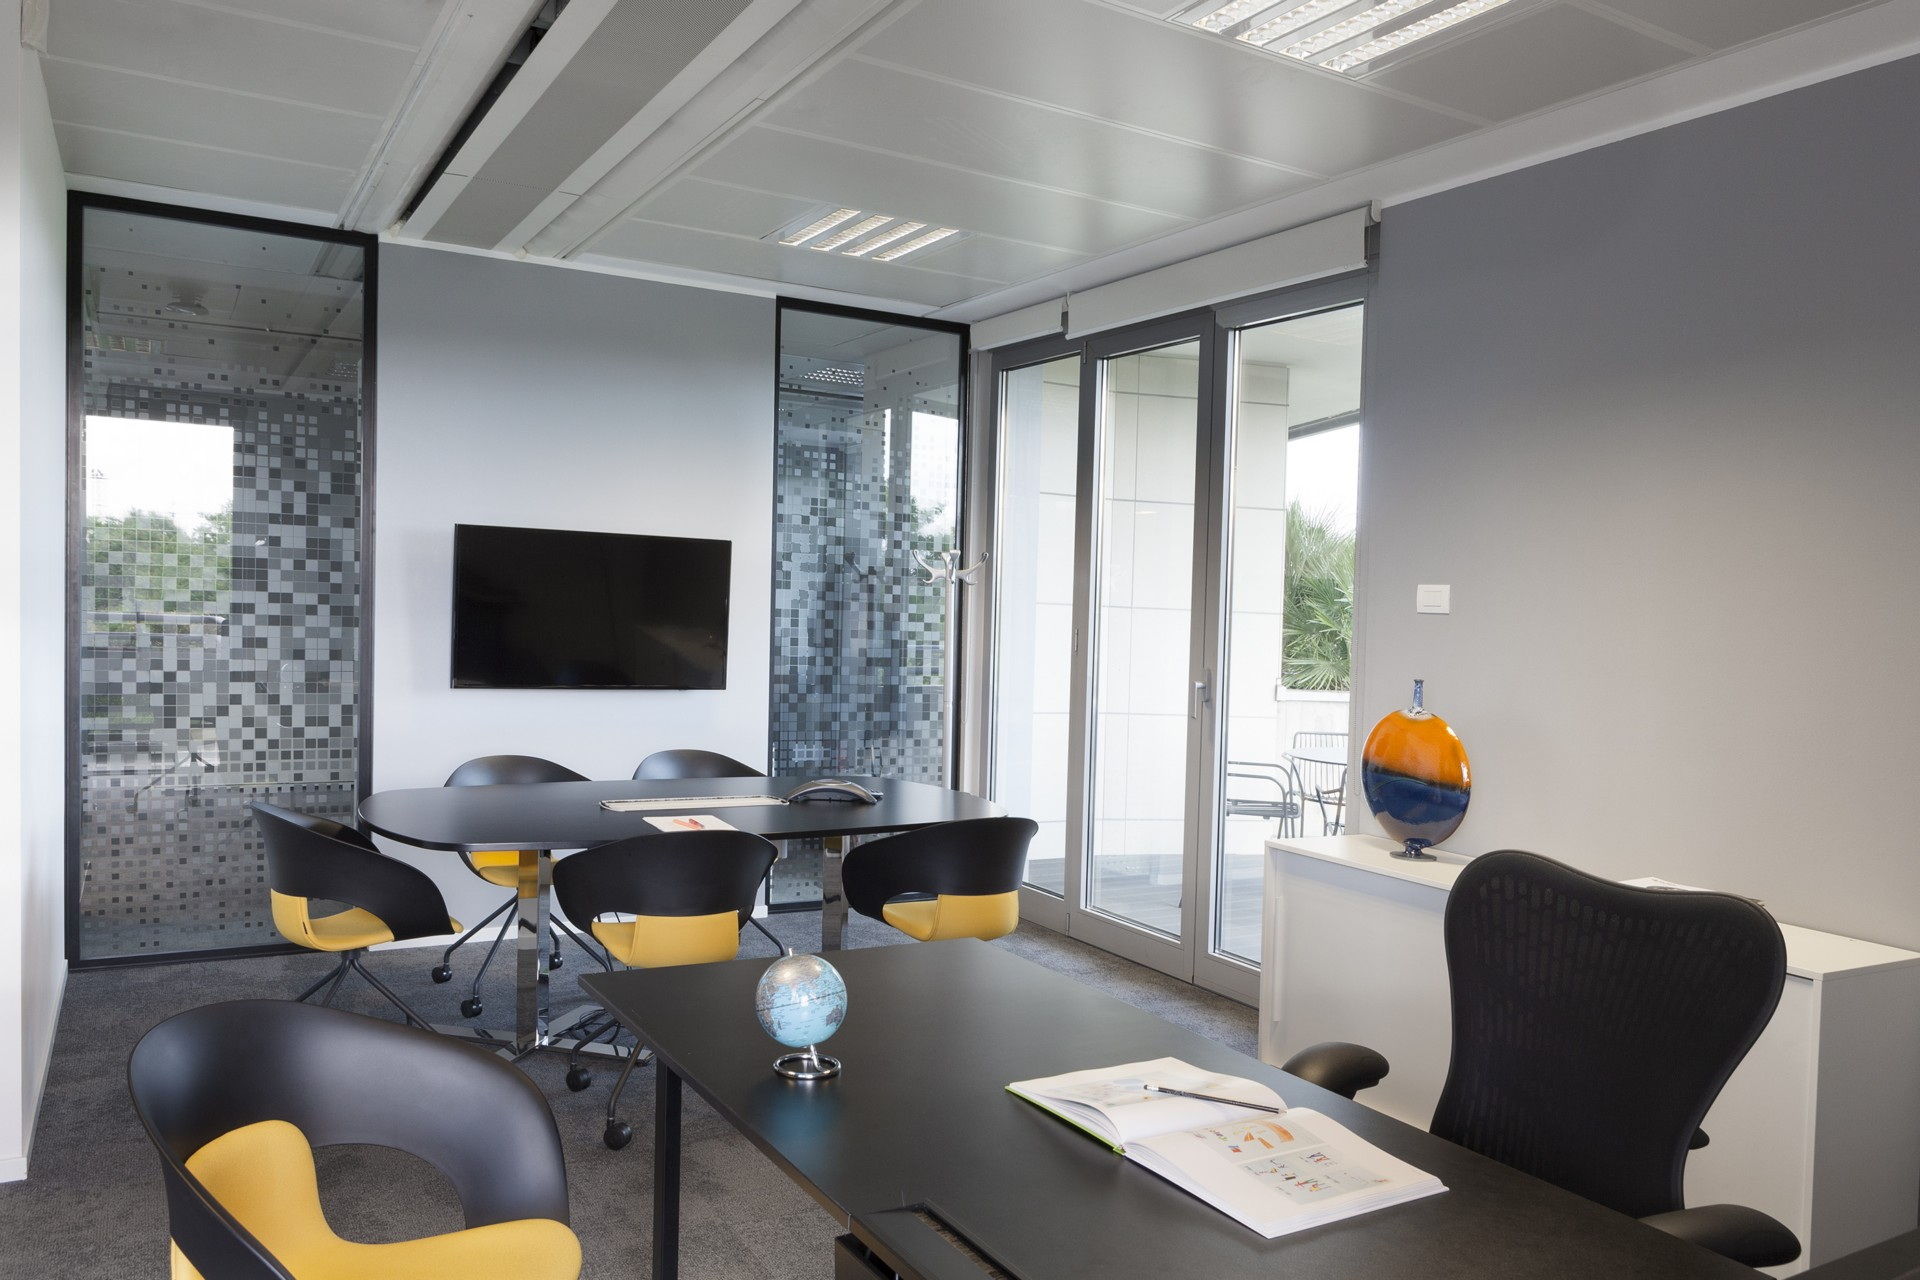 Progetto cmr u massimo roj architects bureaux modernes a milan